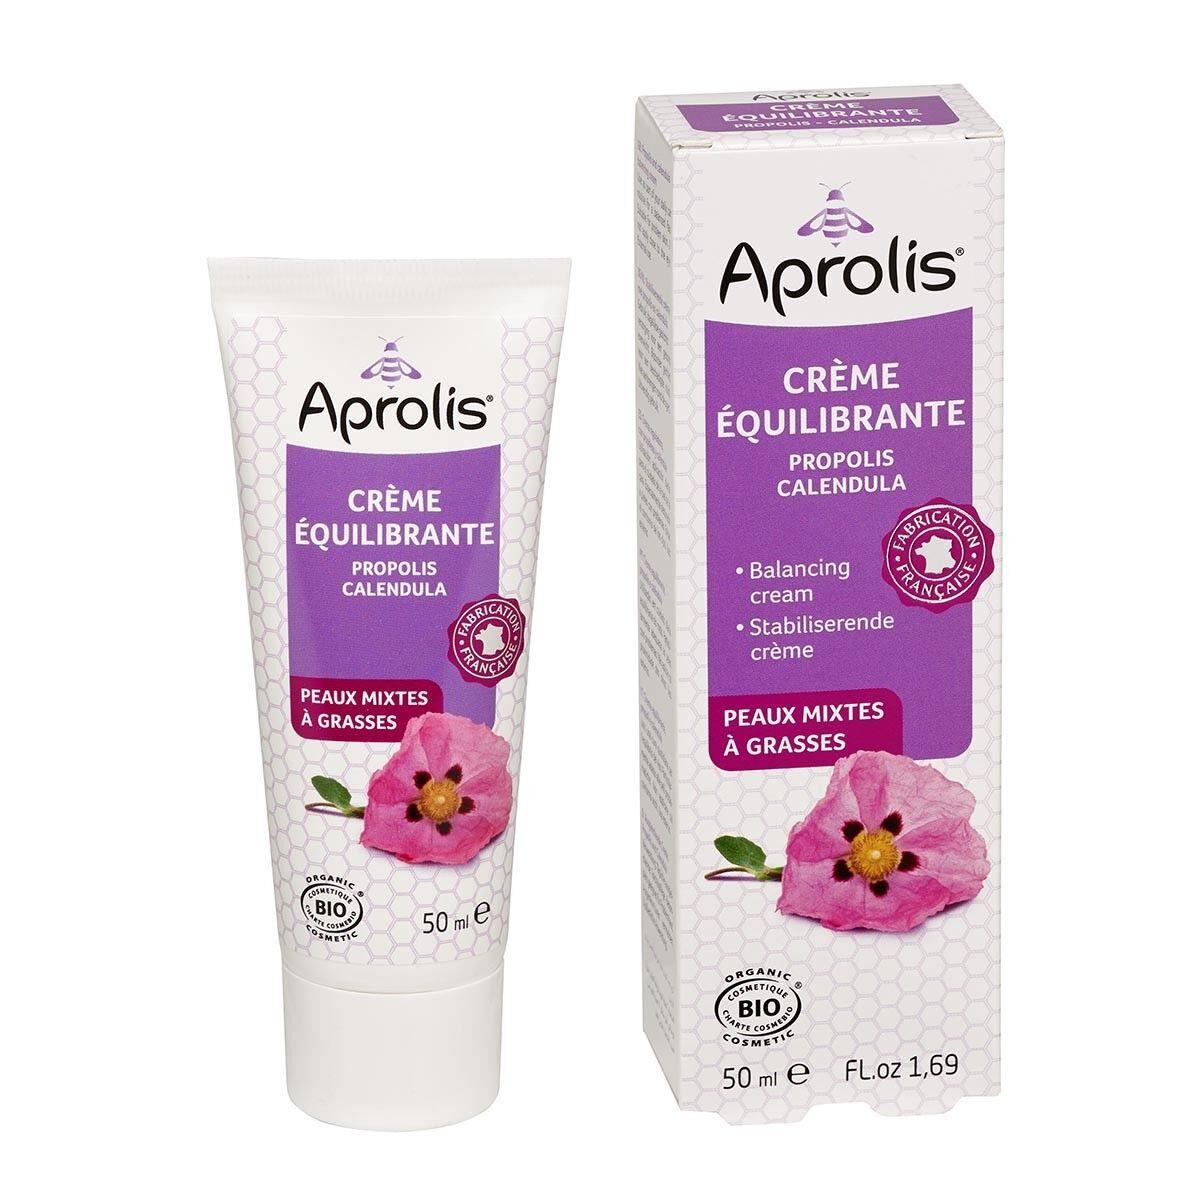 APROLIS Crème Equilibrante Propolis-Calendula 50ml Bio - Aprolis